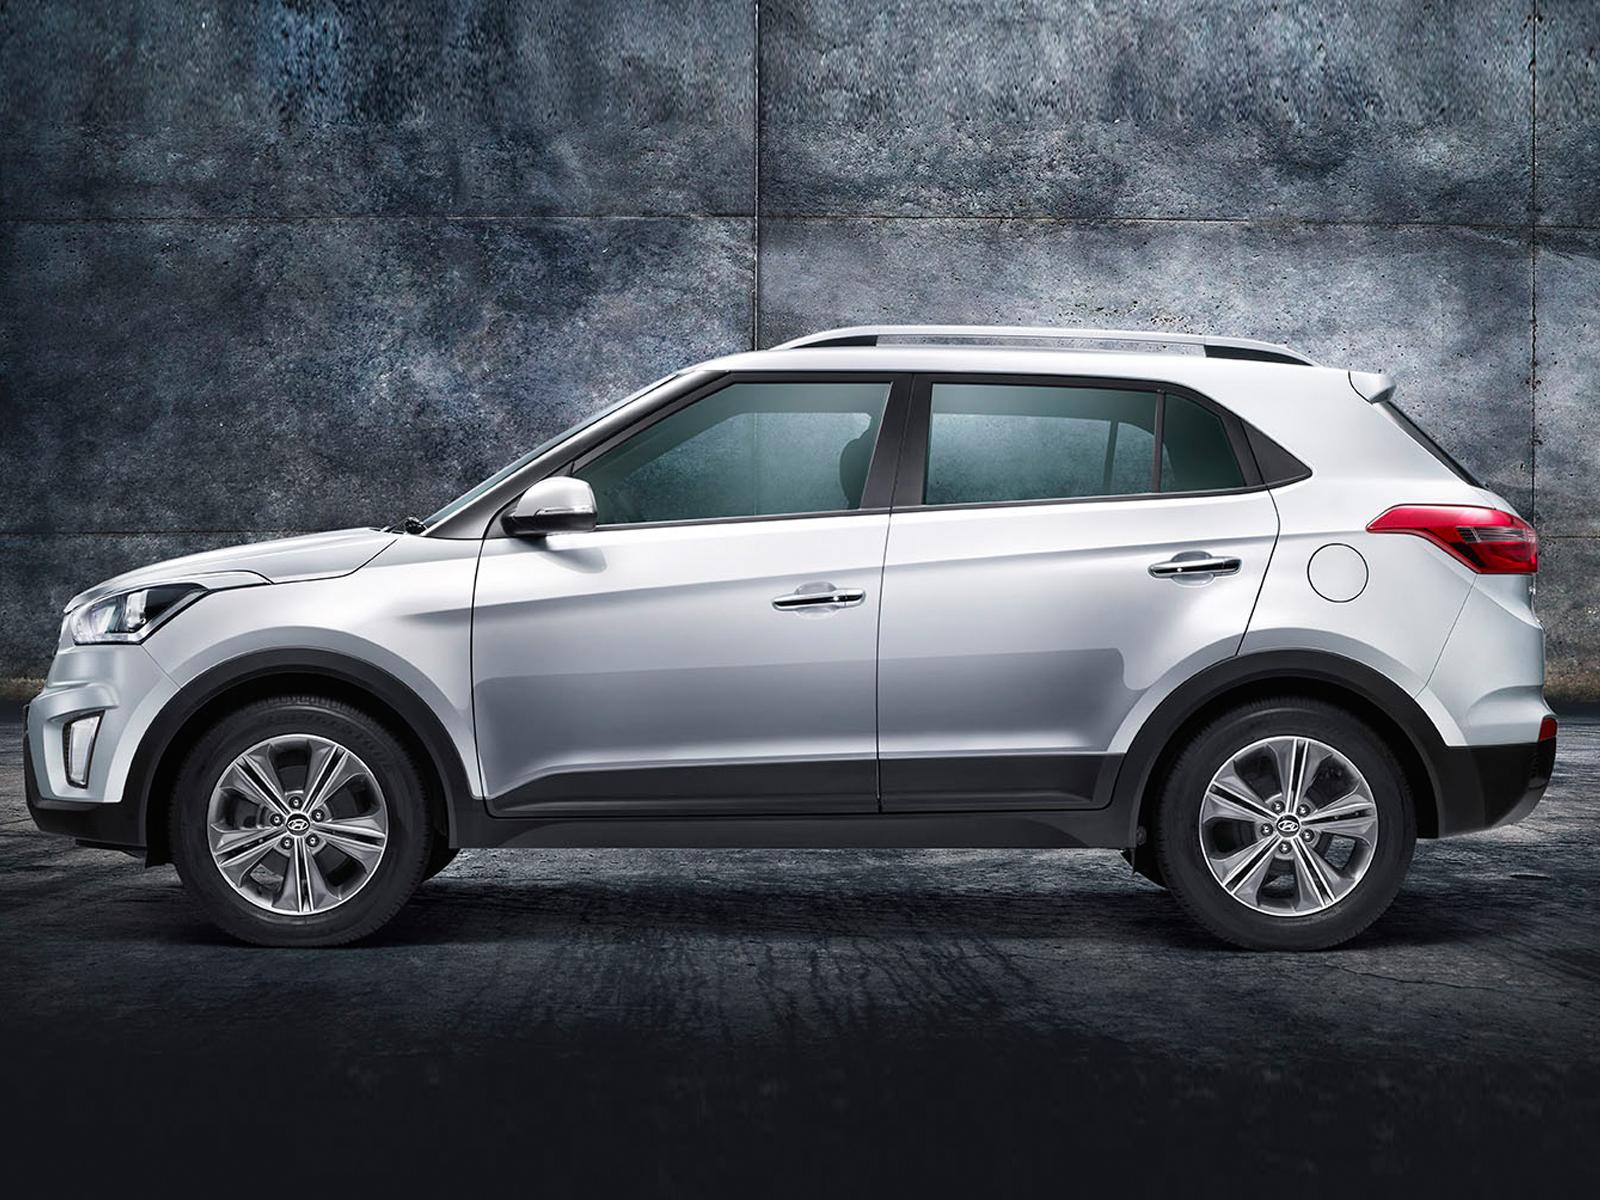 Hyundai Creta Suv Side View